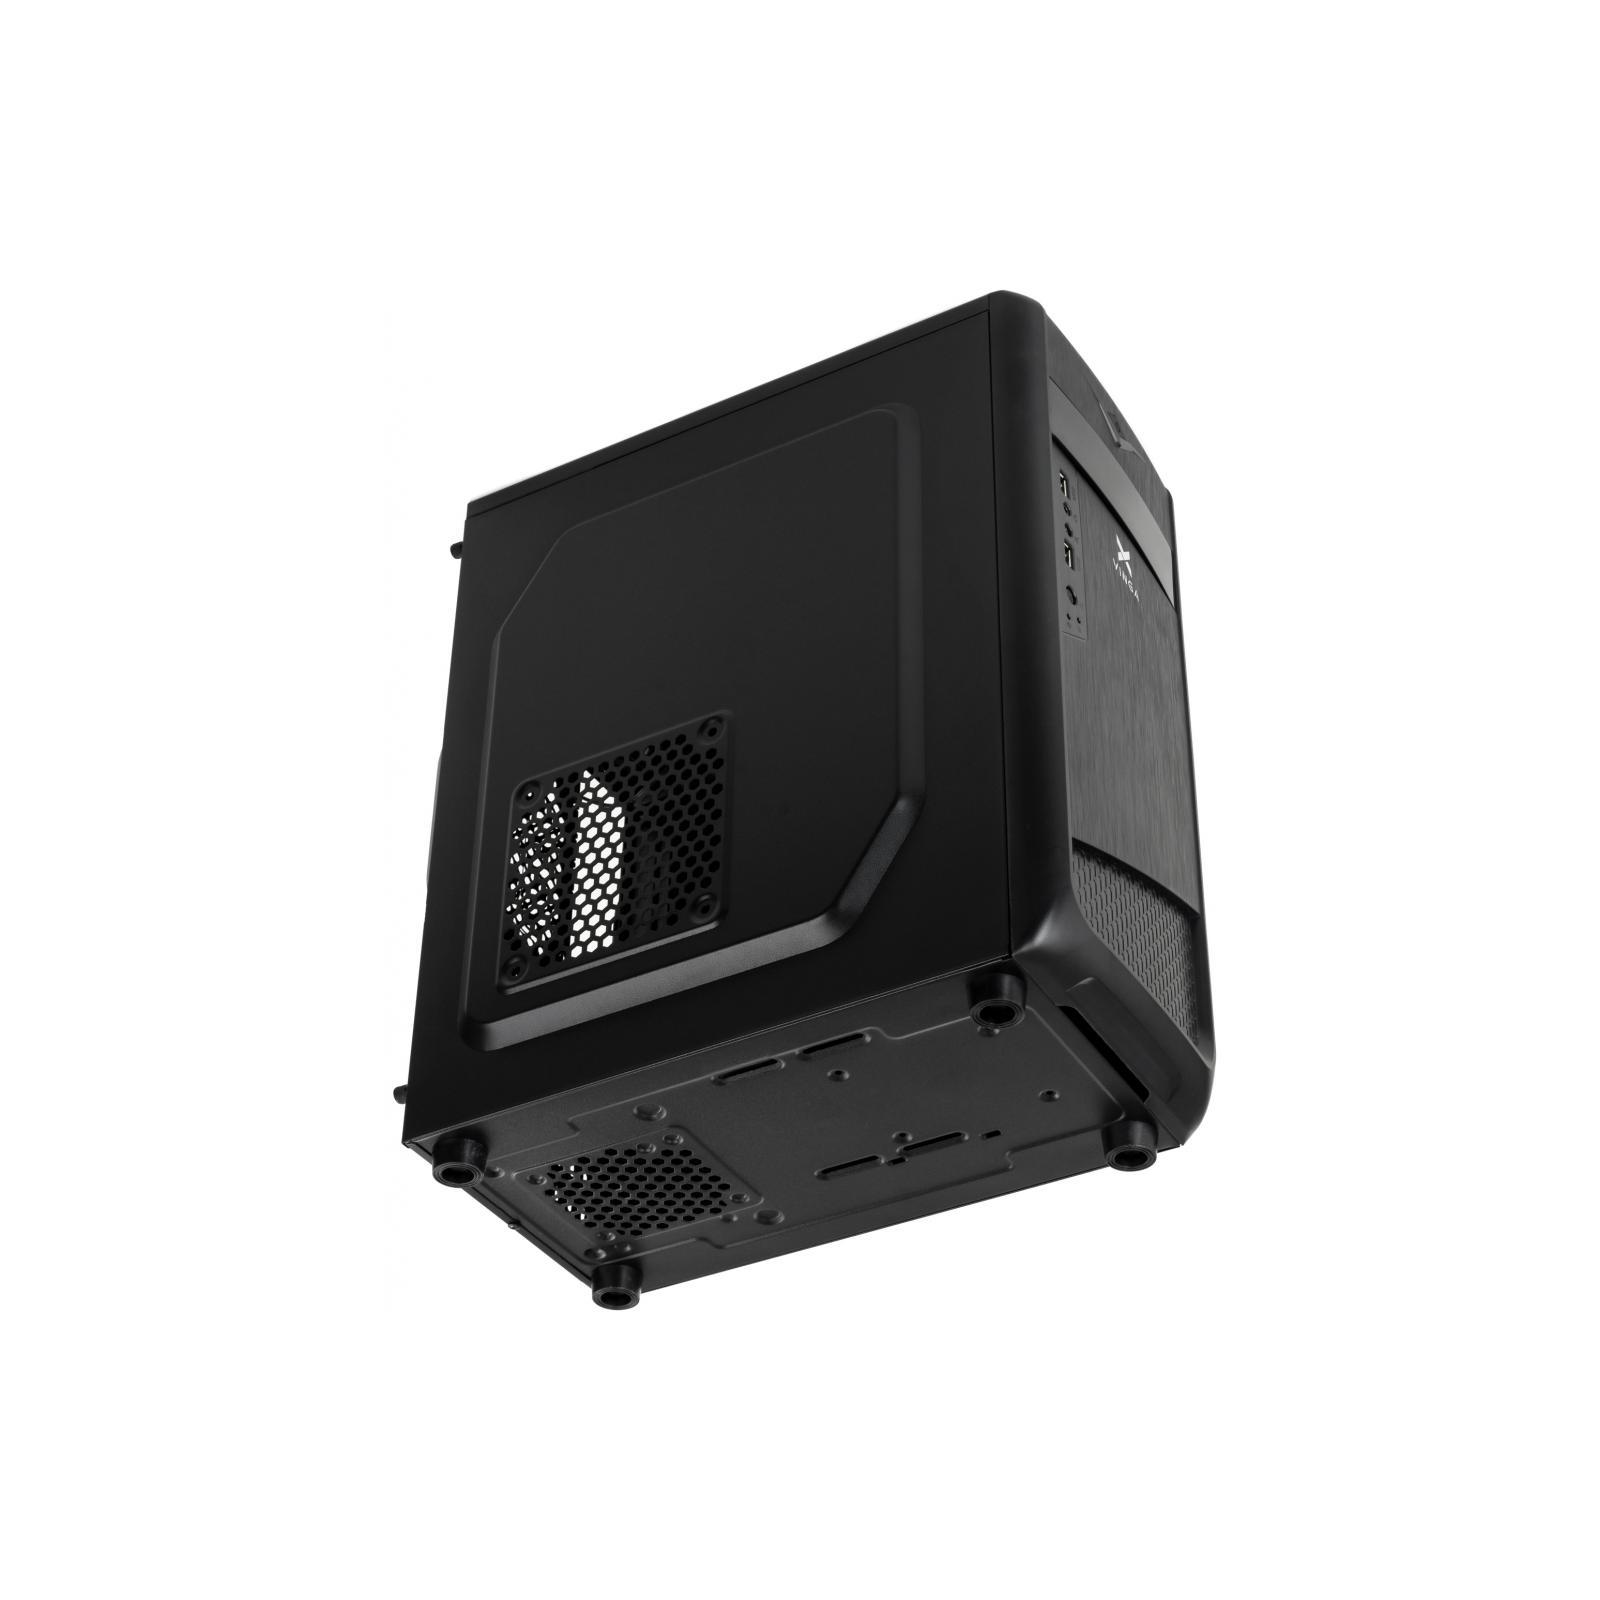 Компьютер Vinga Basic A0171 (E1M4INTW.A0171) изображение 4